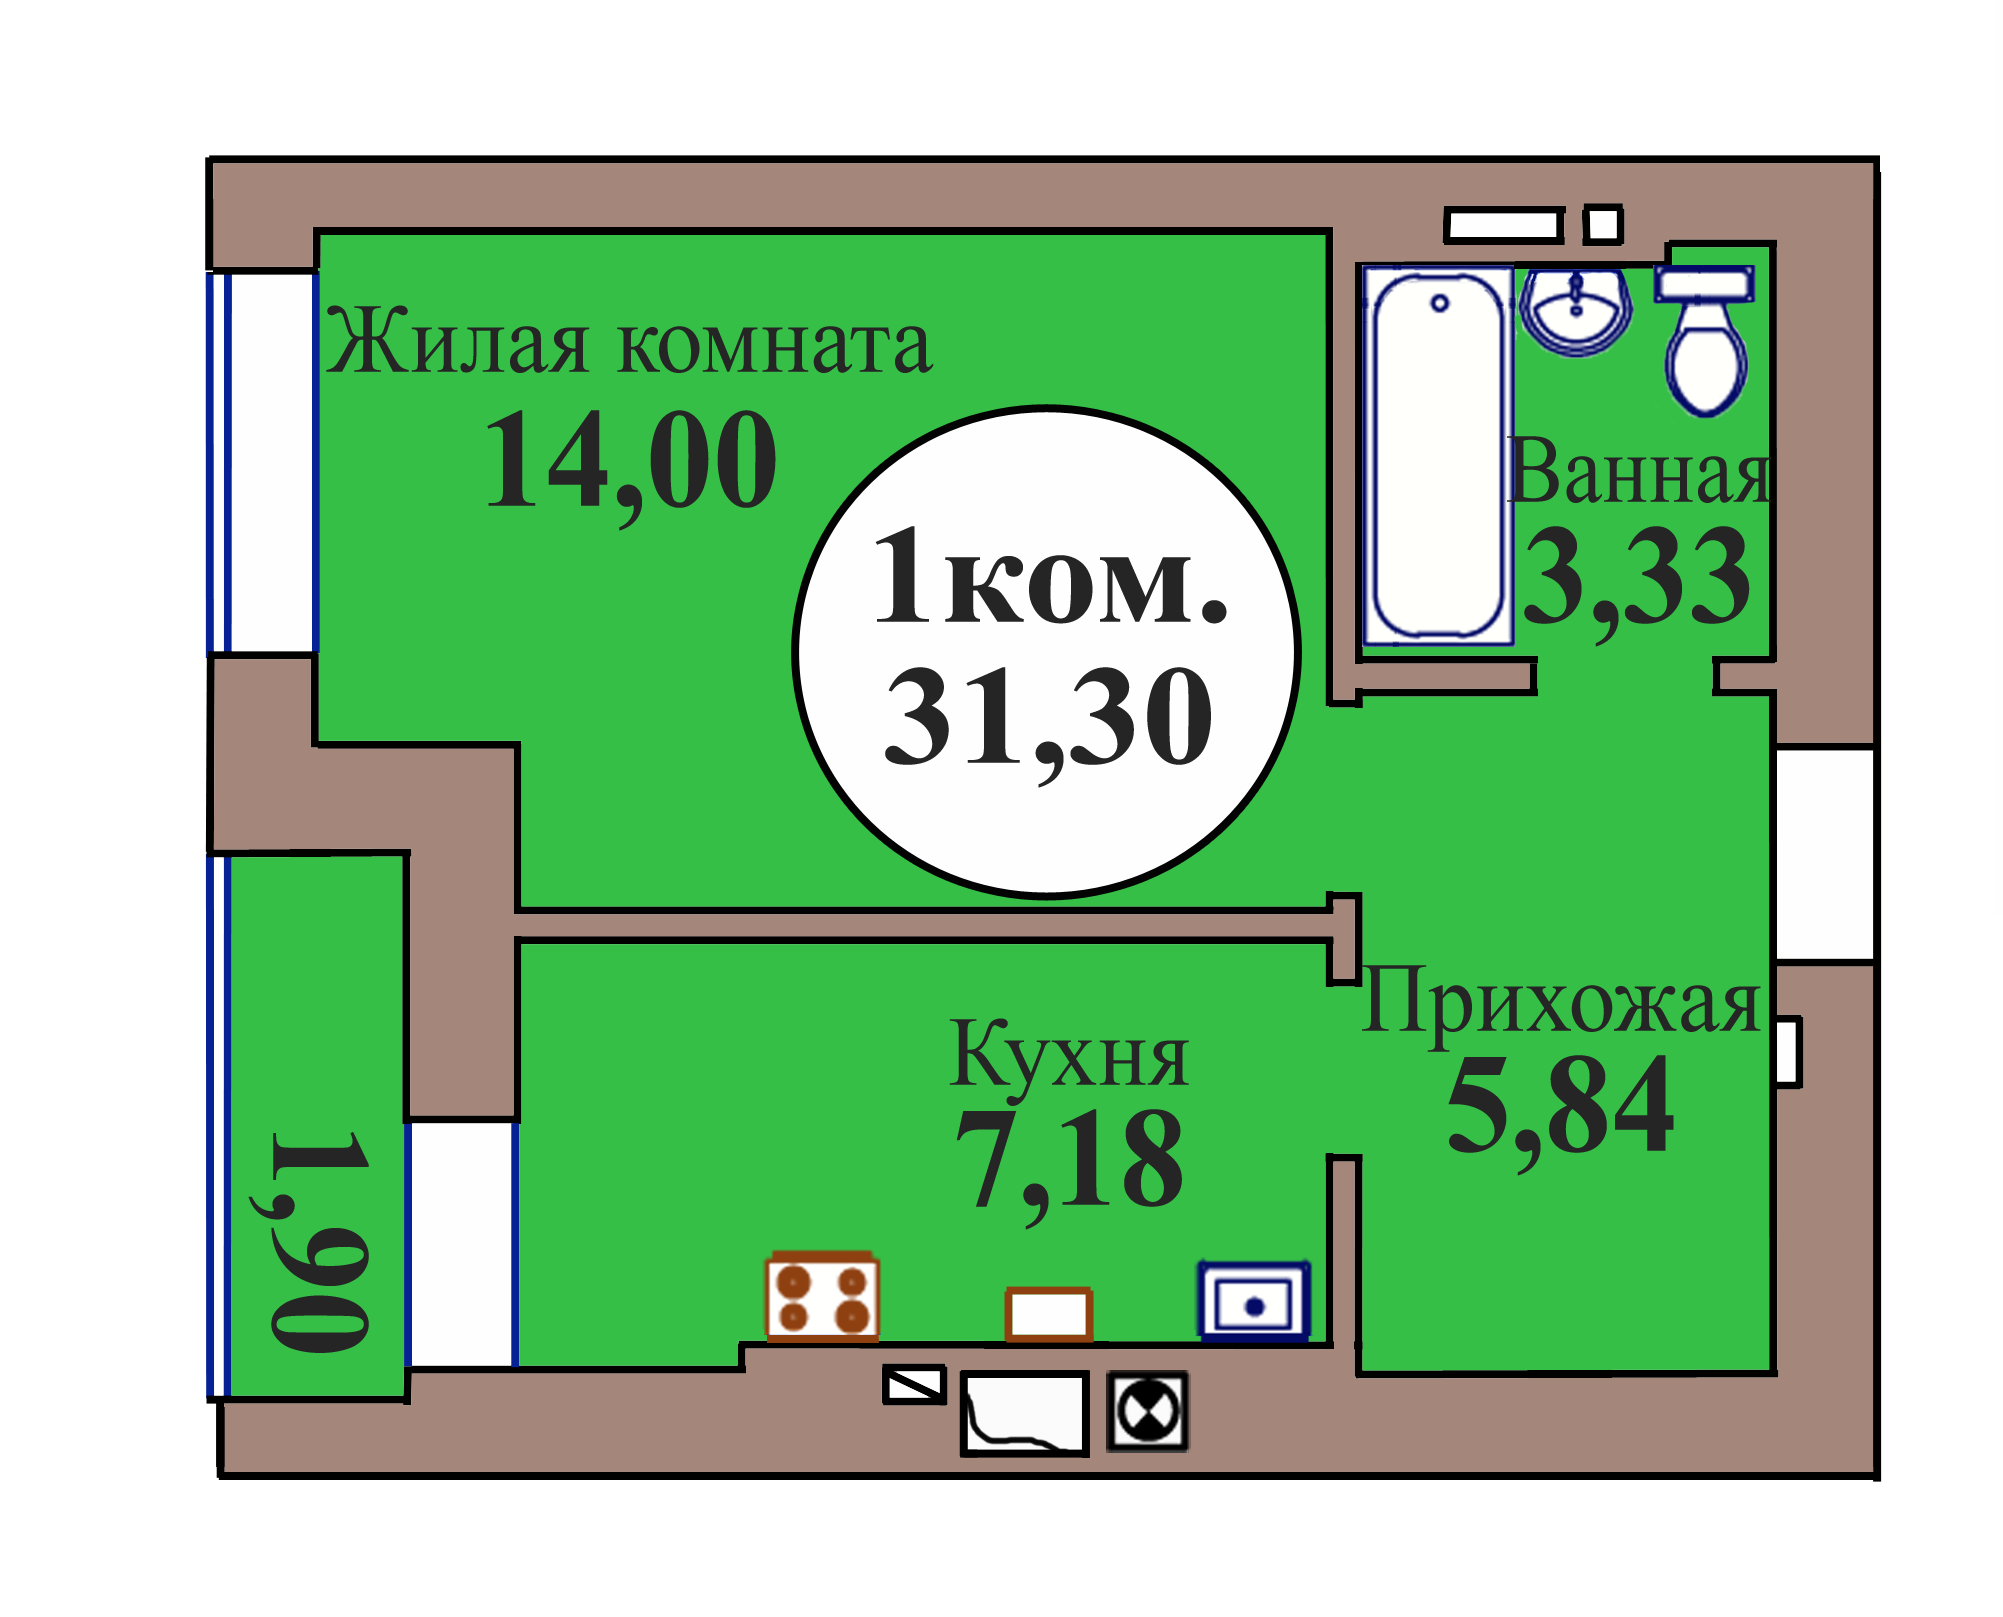 1-комн. кв. по ГП дом №3, МКР Васильково, кв. 19 в Калининграде